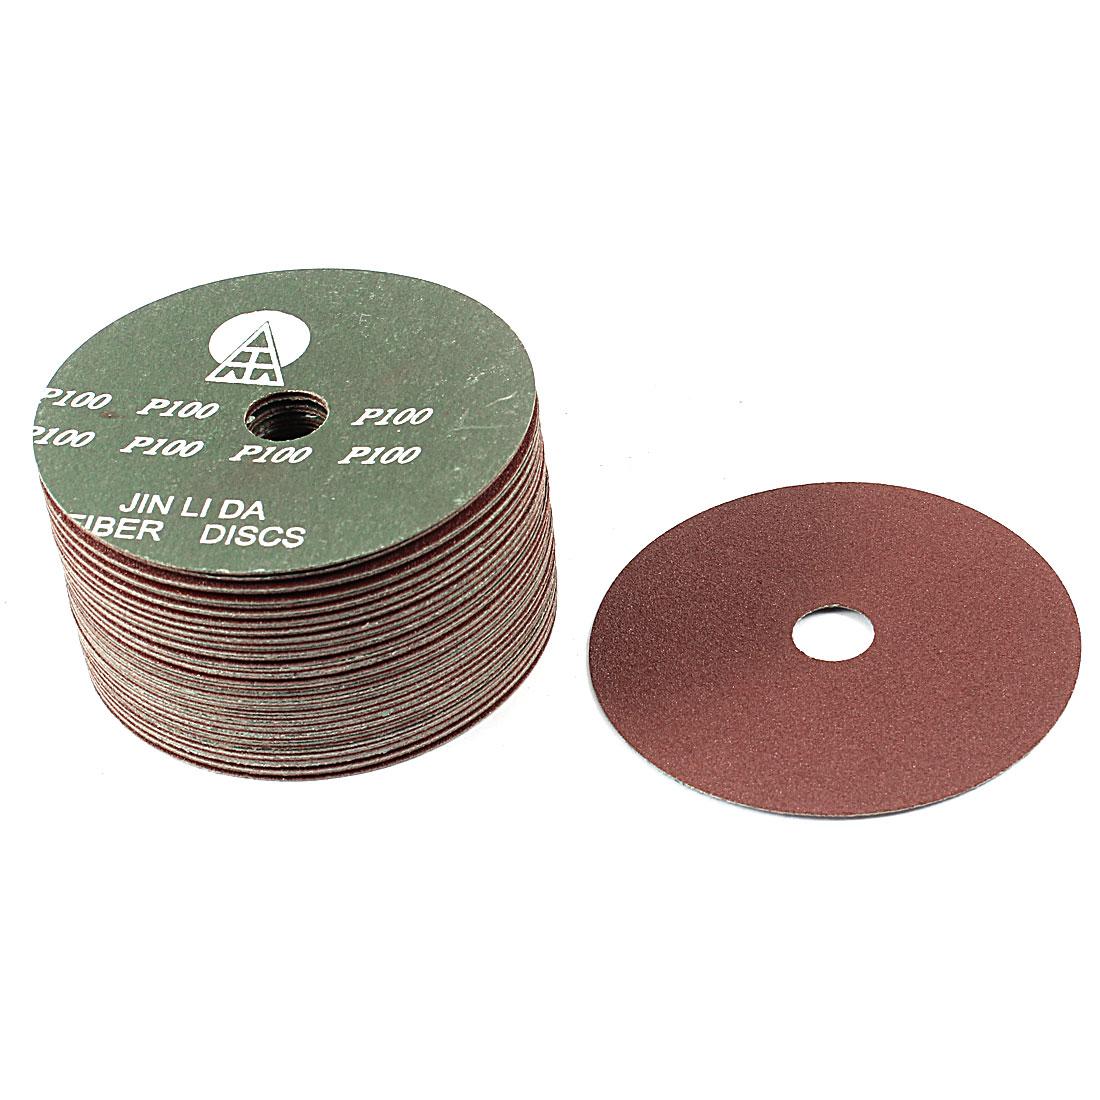 P100 Slice Grinding Disc Cutting Wheel Tool 100mm x 16mm x 0.9mm 50pcs